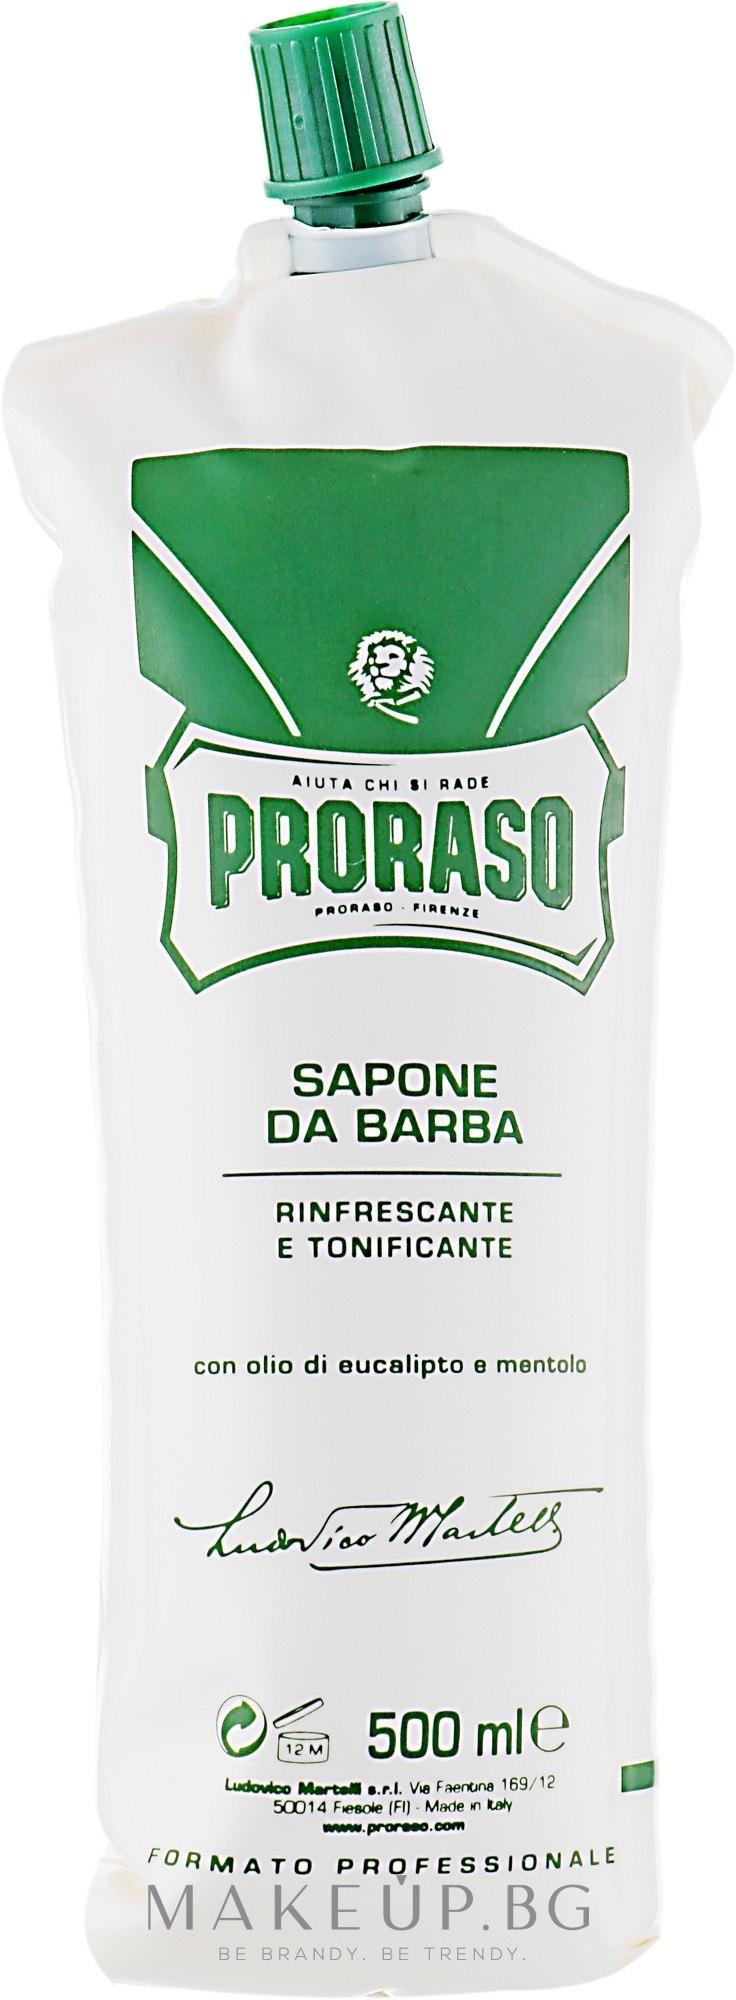 Крем за бръснене с ментол и евкалипт - Proraso Green Shaving Cream — снимка 150 ml